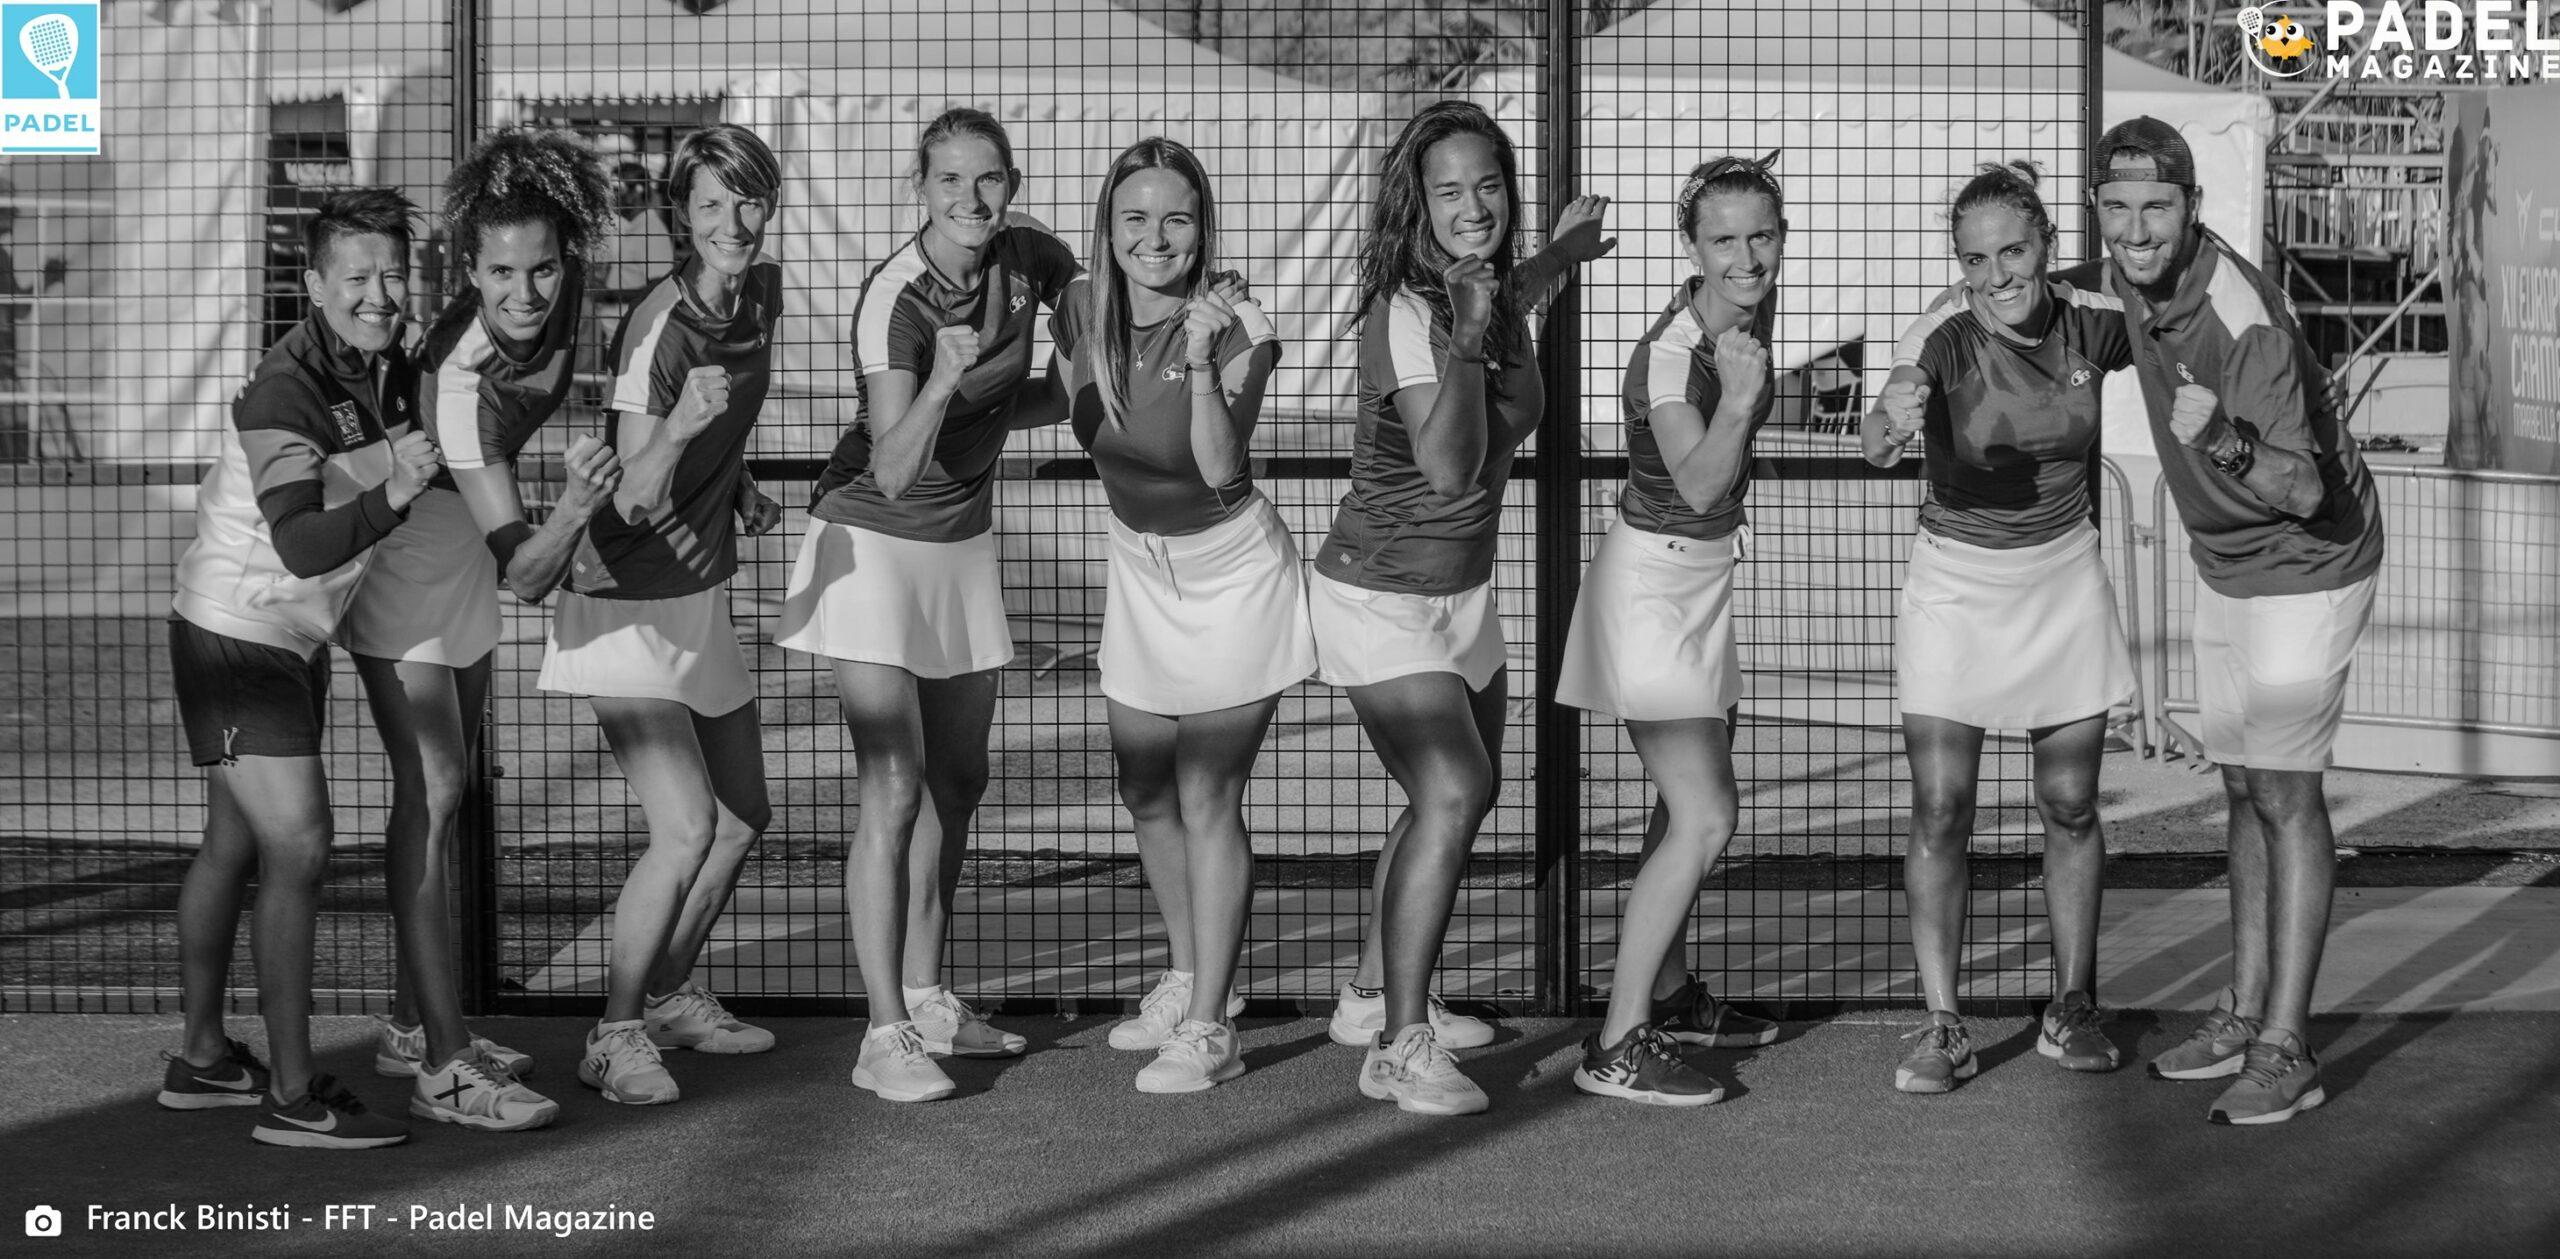 Fransk hold padel damer marbella knyttede knytnæve sort og hvid europa 2021